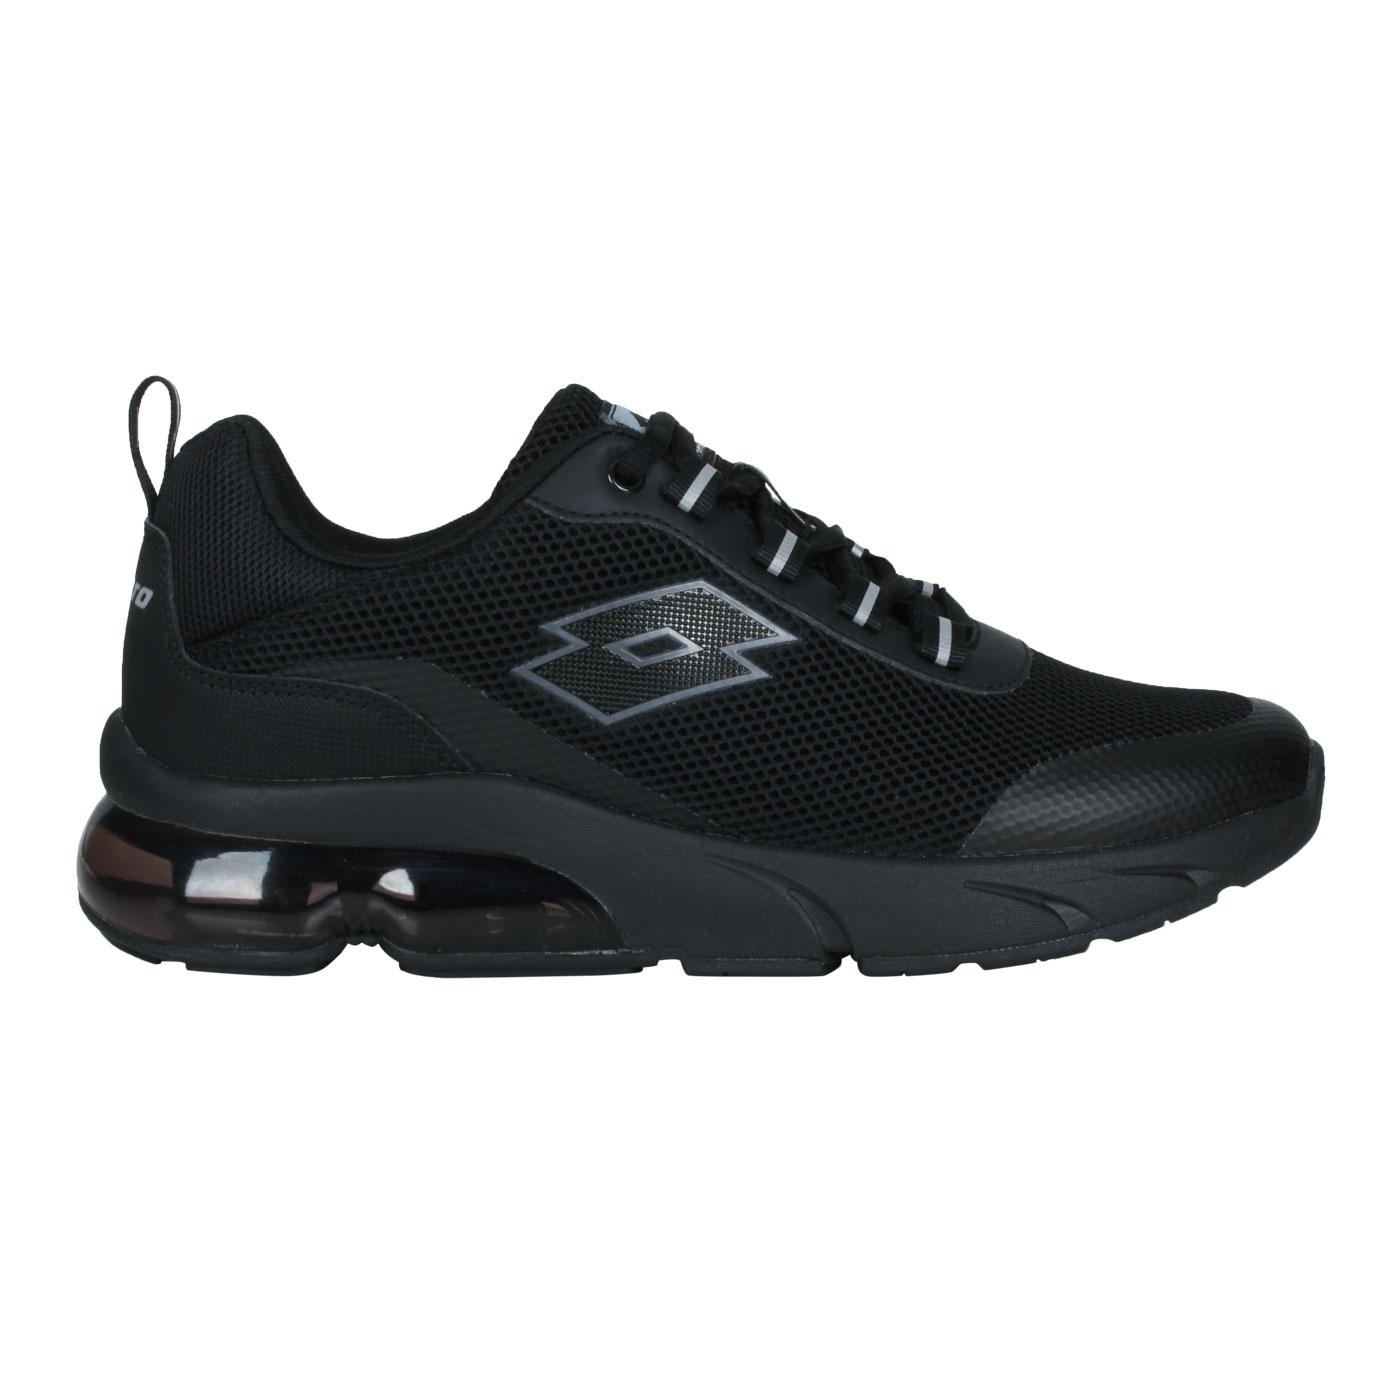 LOTTO 男款AERO POWER II運動鞋 LT1AMR3890 - 黑灰